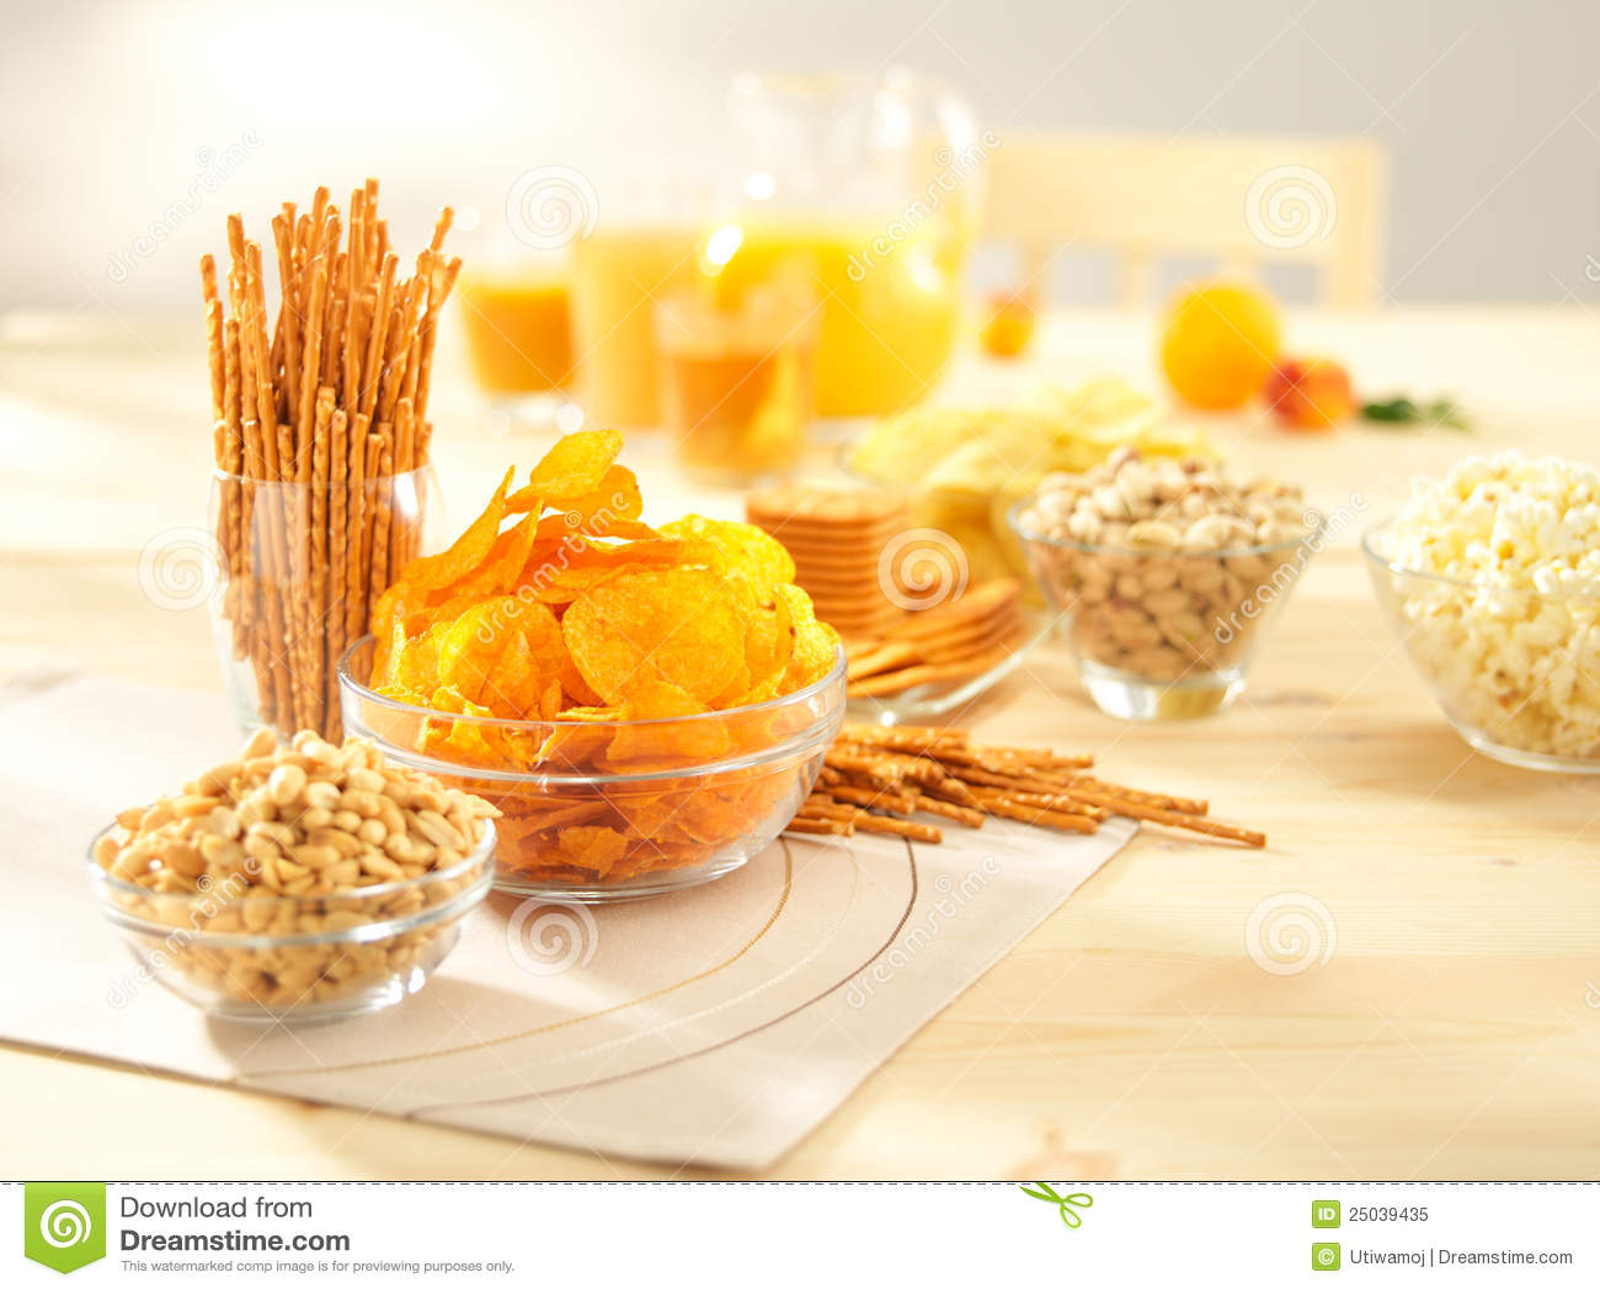 Salty snacks. Pretzels, chips, peanuts, crackers.